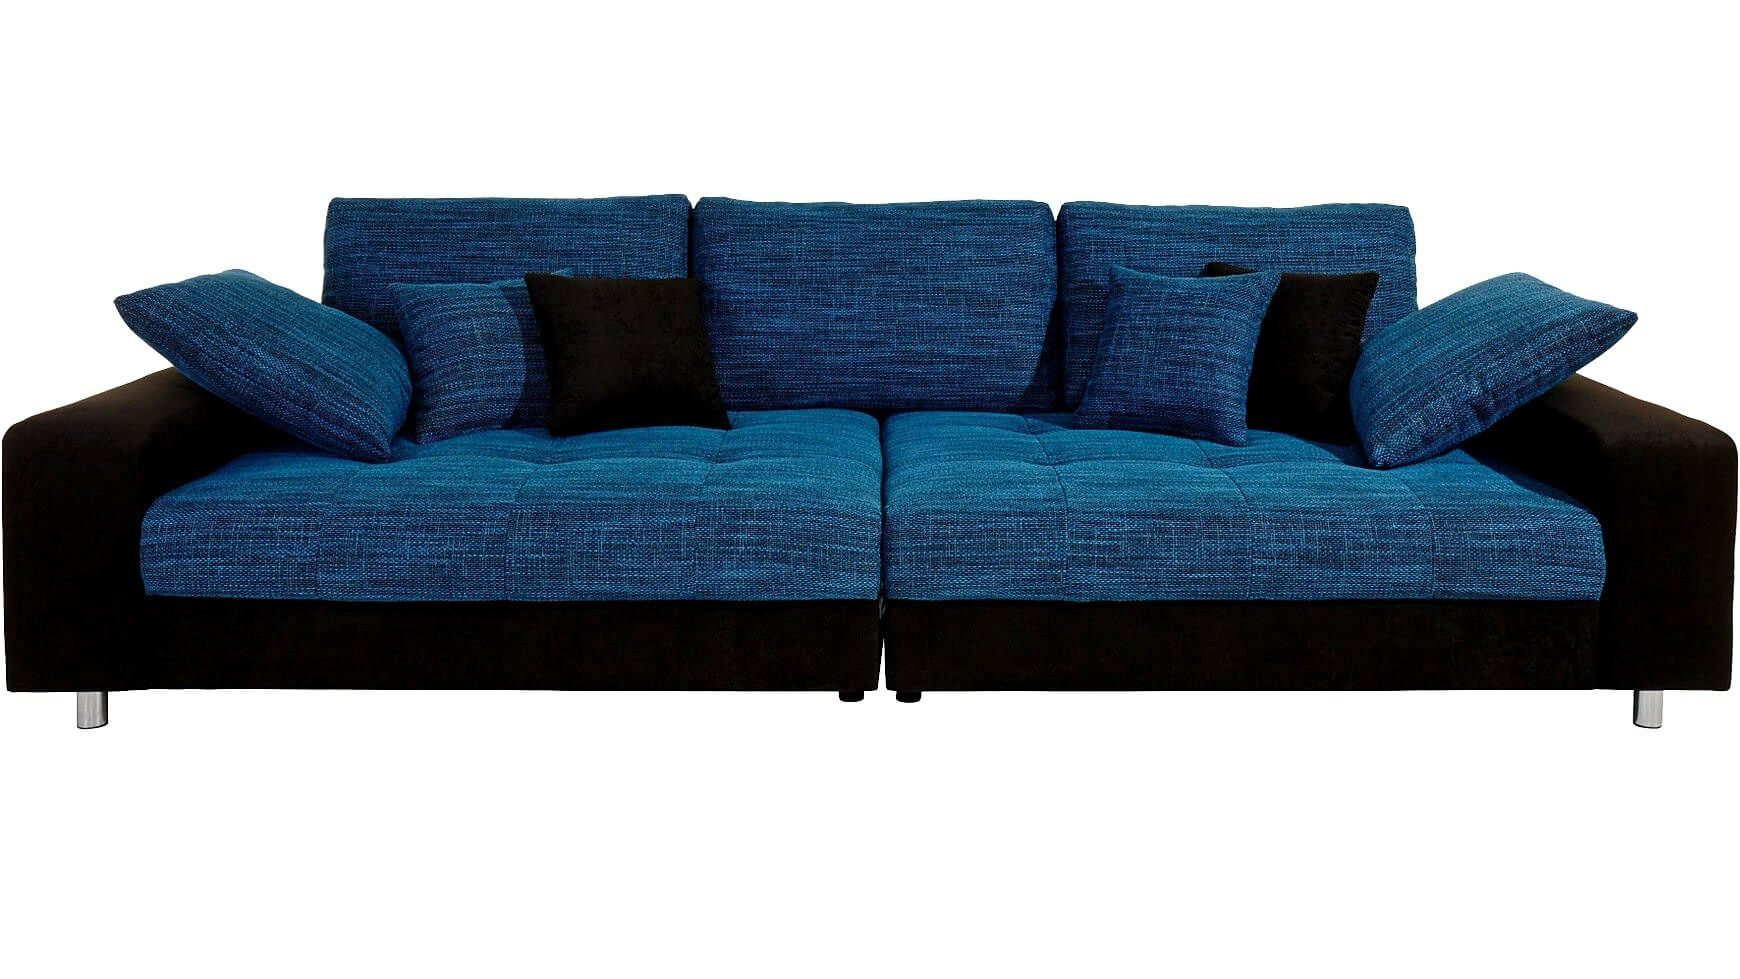 Anstandig Couch Billig Kaufen Sofa Styling Big Sofas Modern Couch